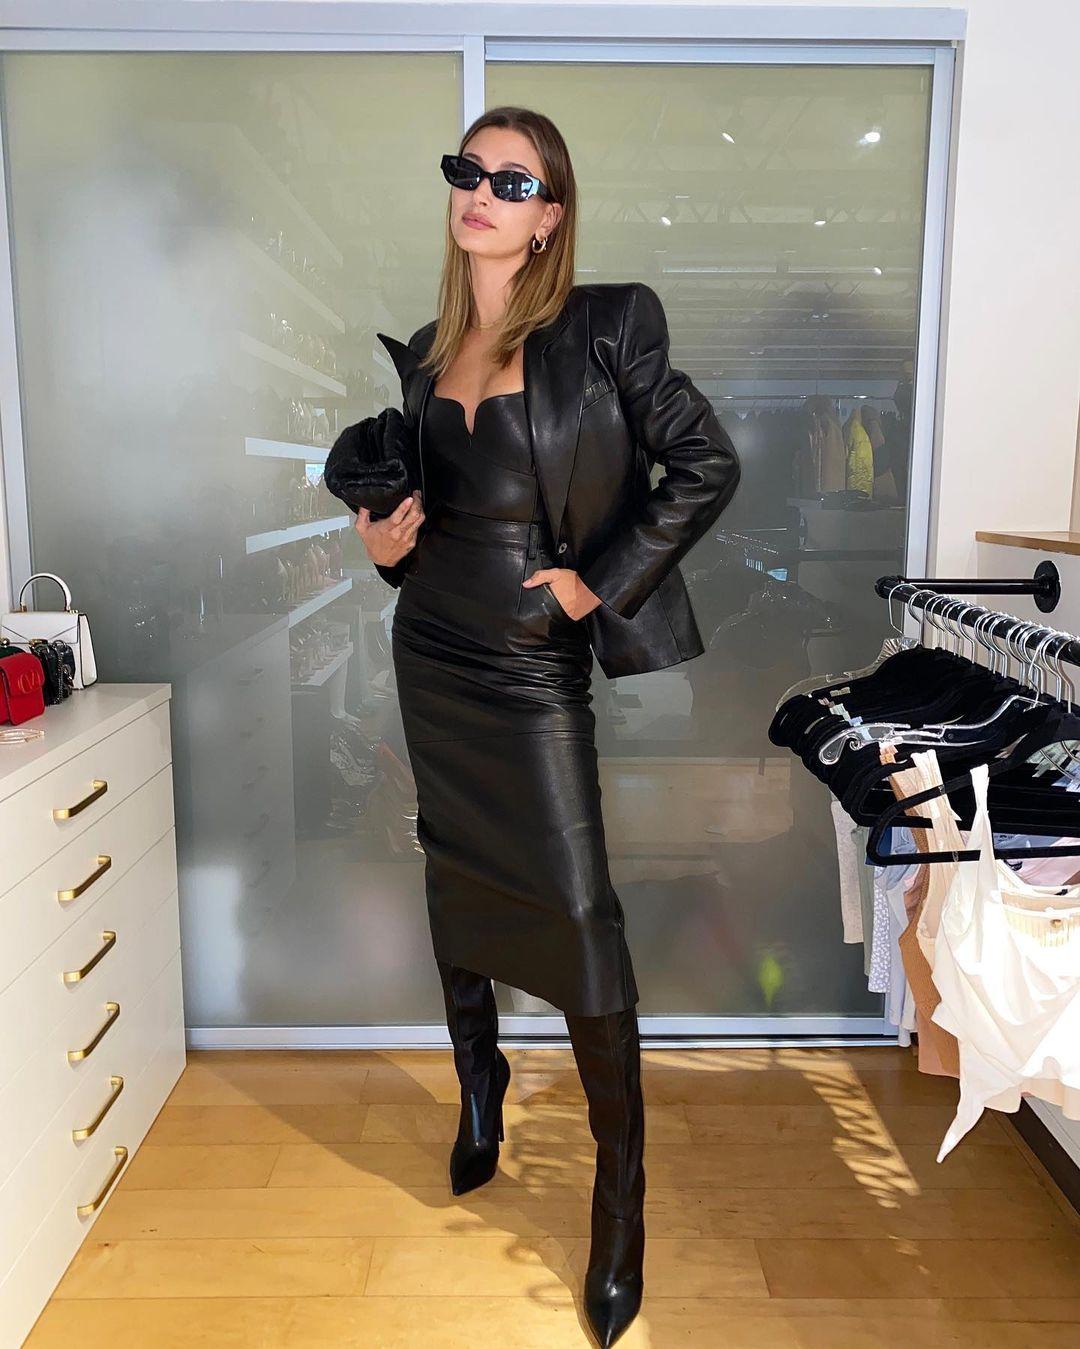 whowhatwear 159384436 189773729259725 3065947423699521775 n Alternatives to the LBD (Little Black Dress)